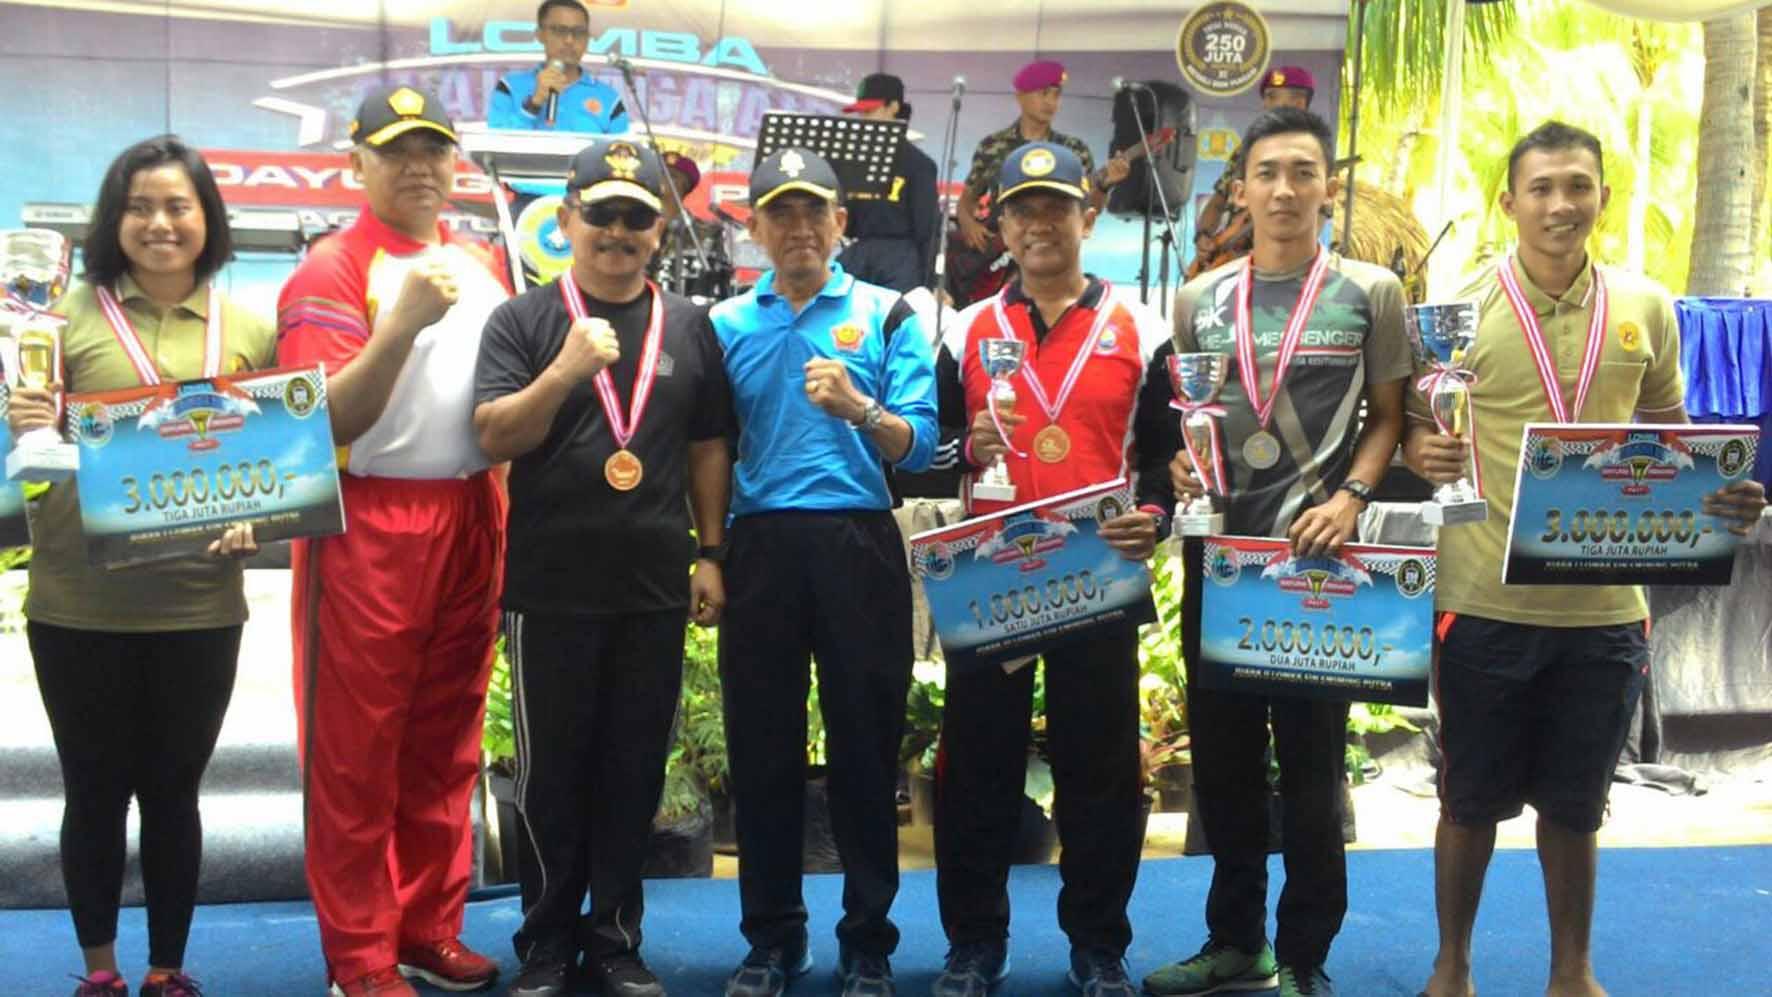 Prestasi Paskhas pada Lomba Renang Laut Piala Panglima TNI